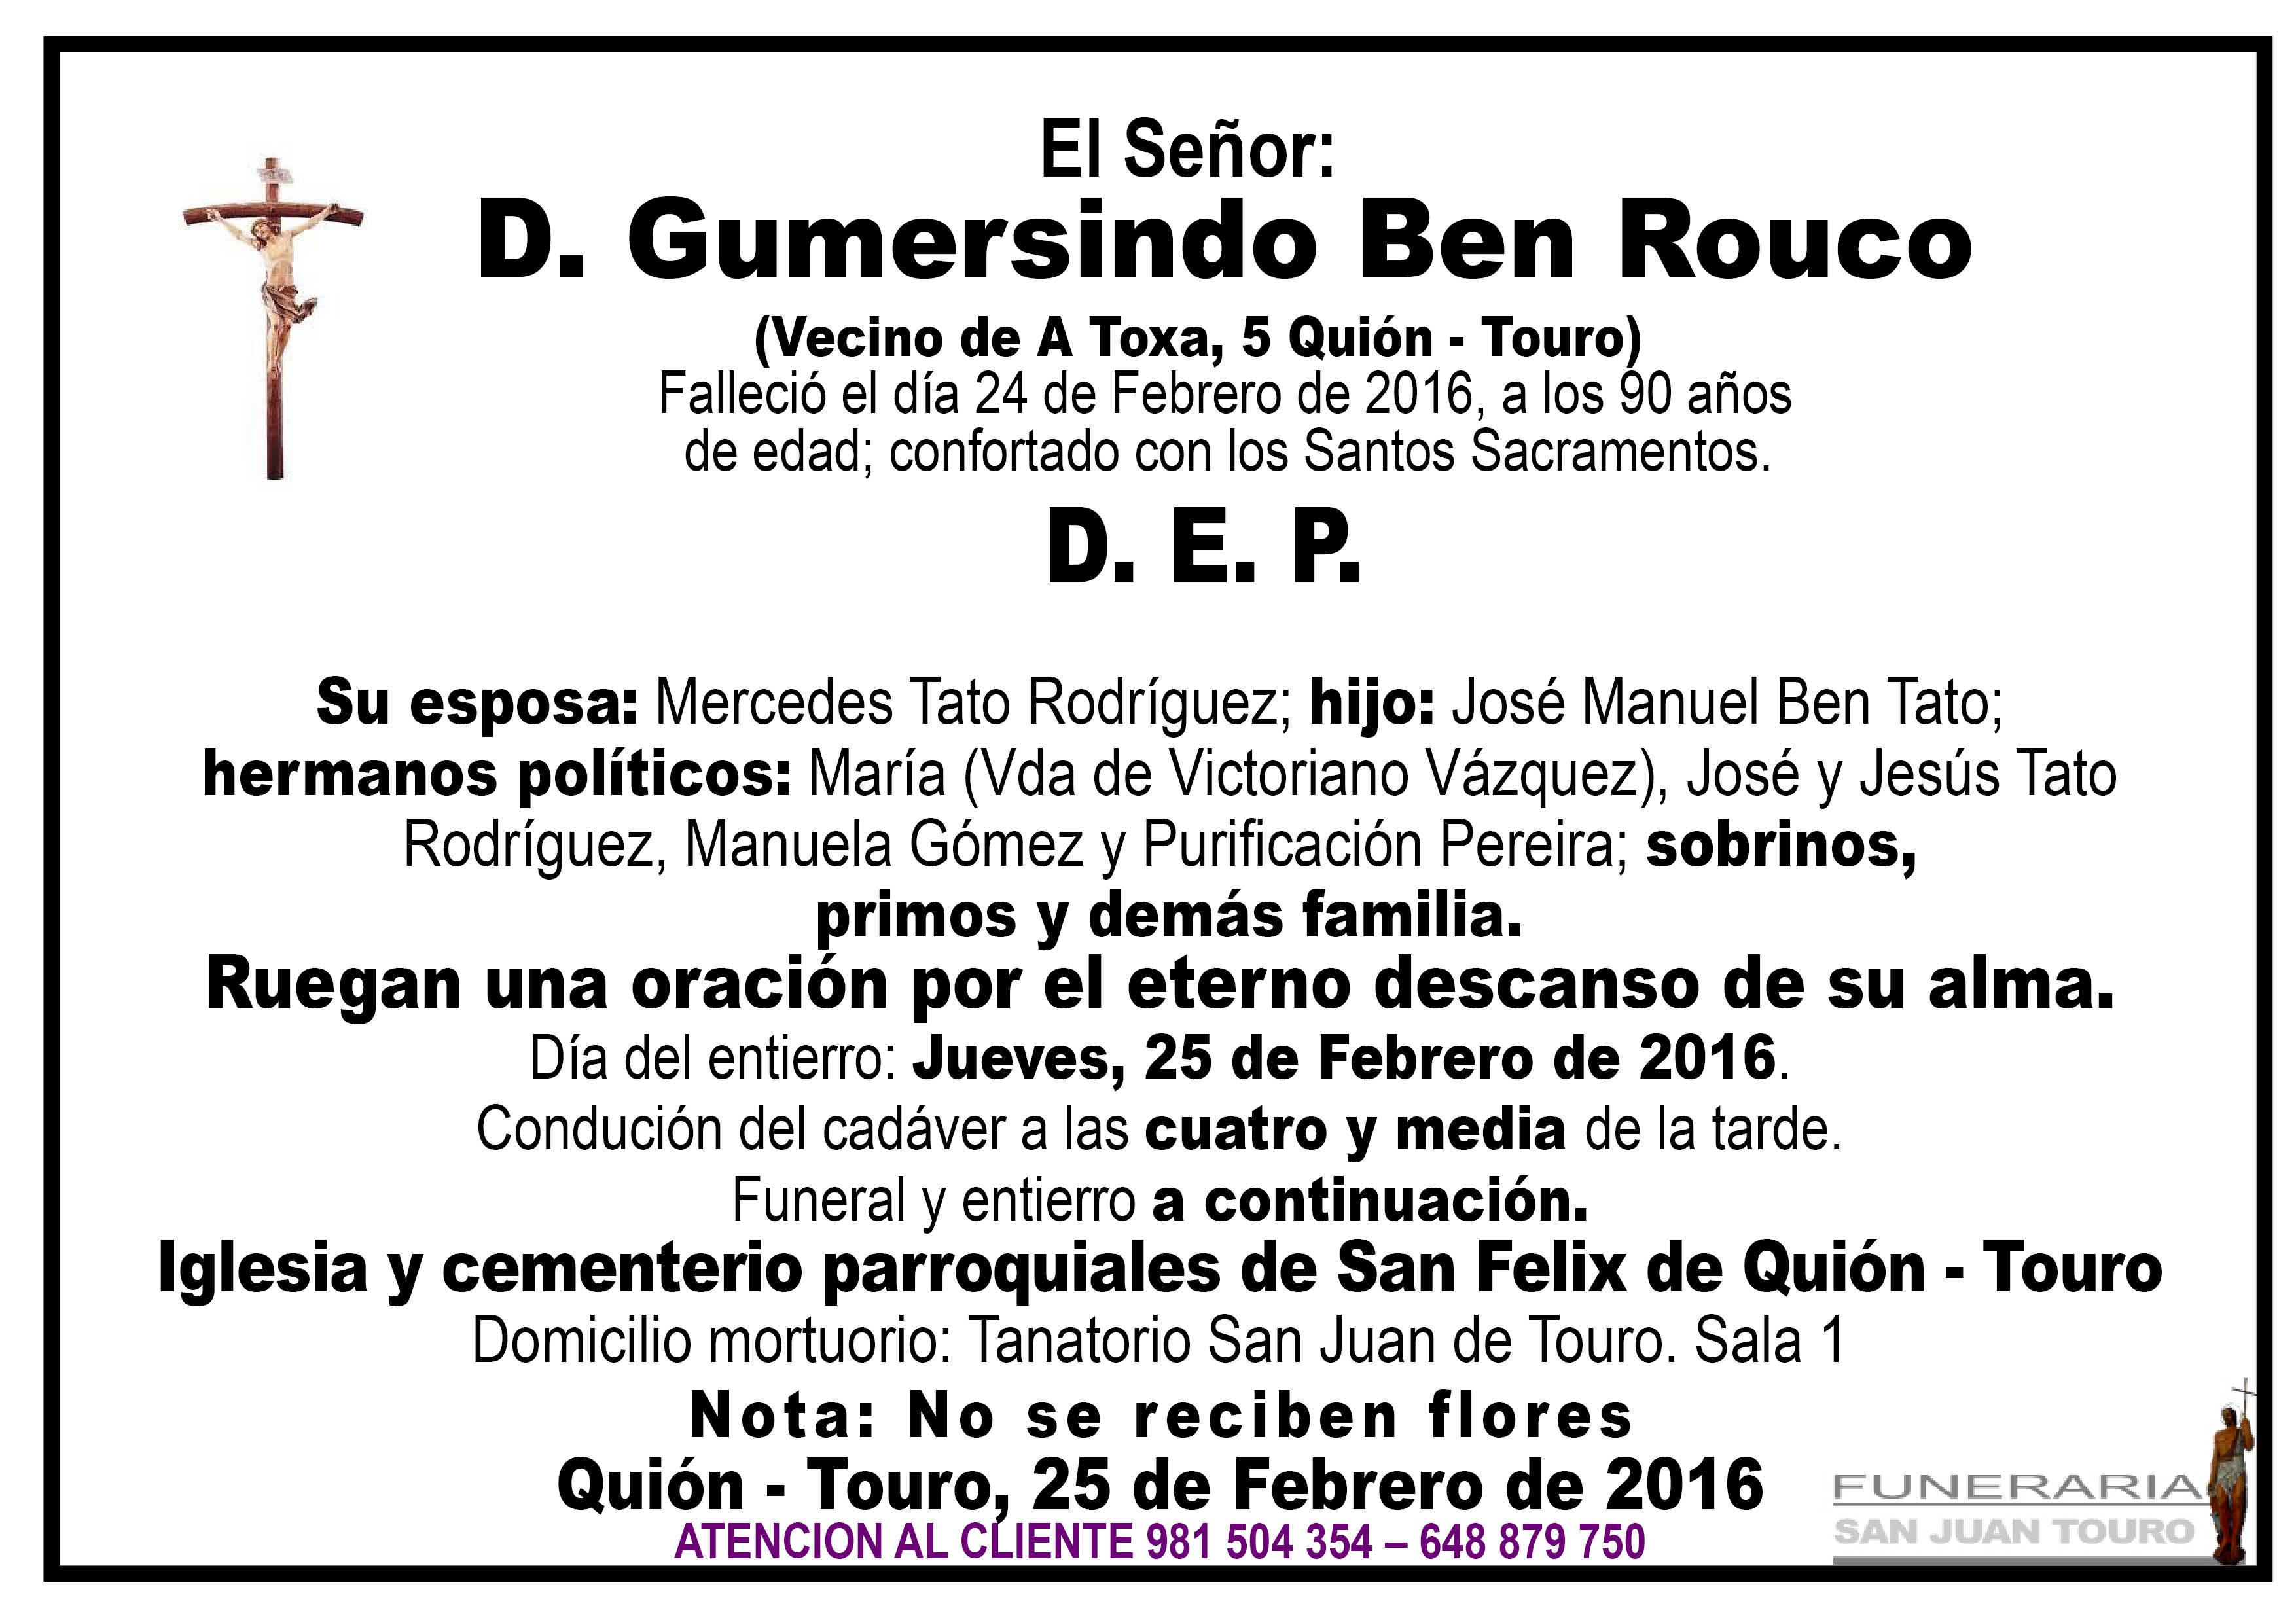 Esquela de SEPELIO D. GUMERSINDO BEN ROUCO